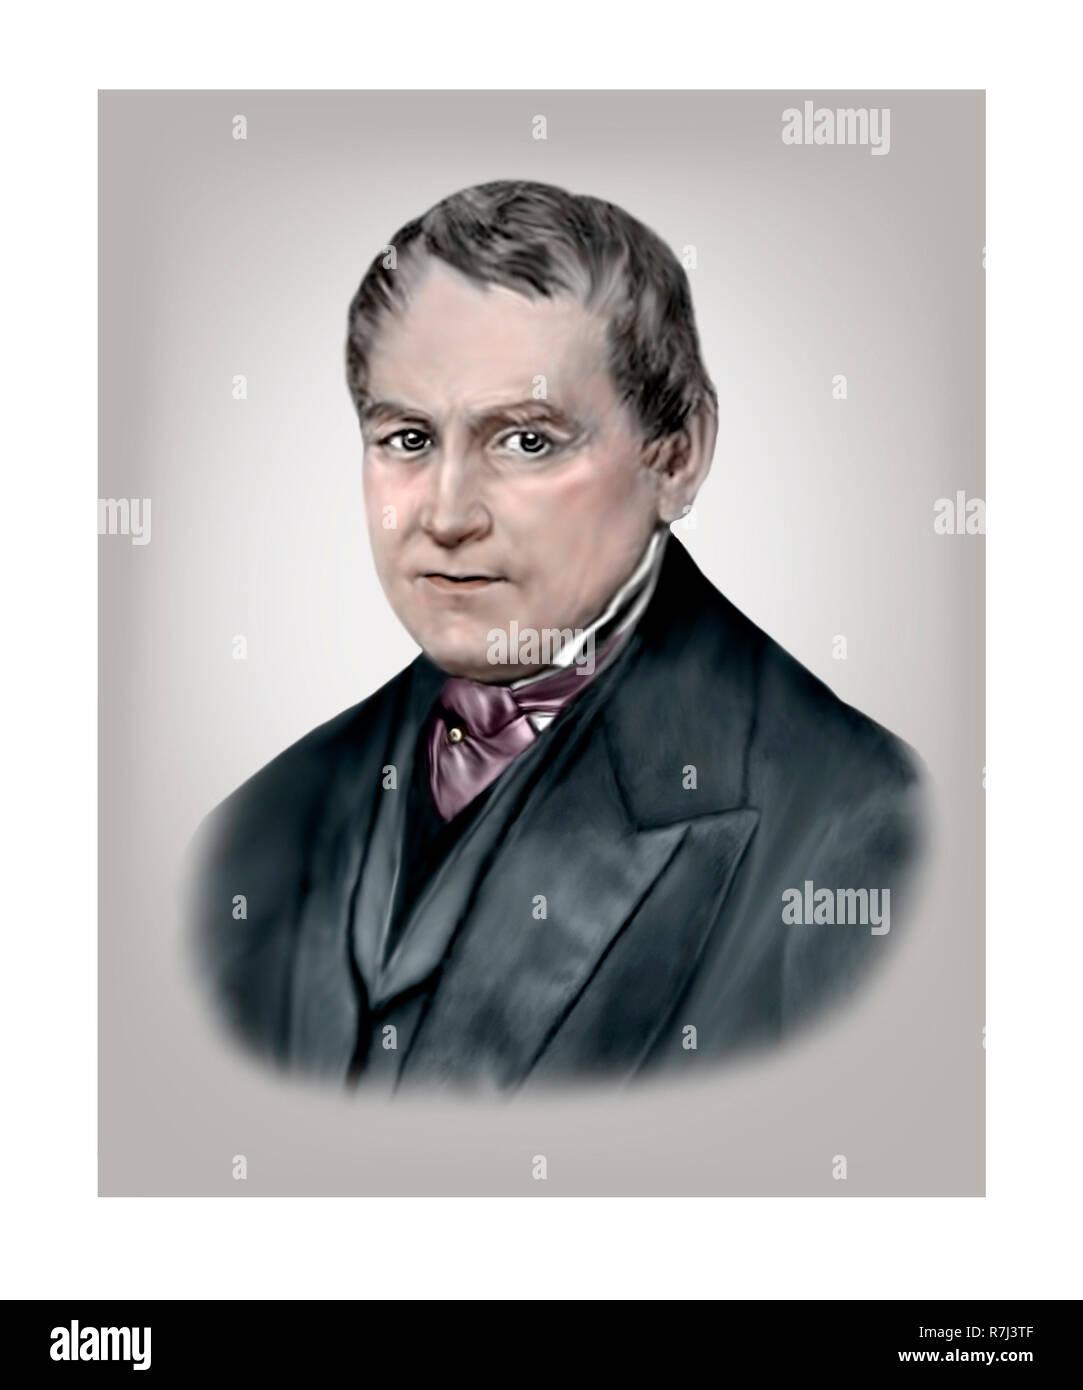 Christian Leopold von Buch 1774 - 1853 El geólogo paleontólogo alemán Foto de stock